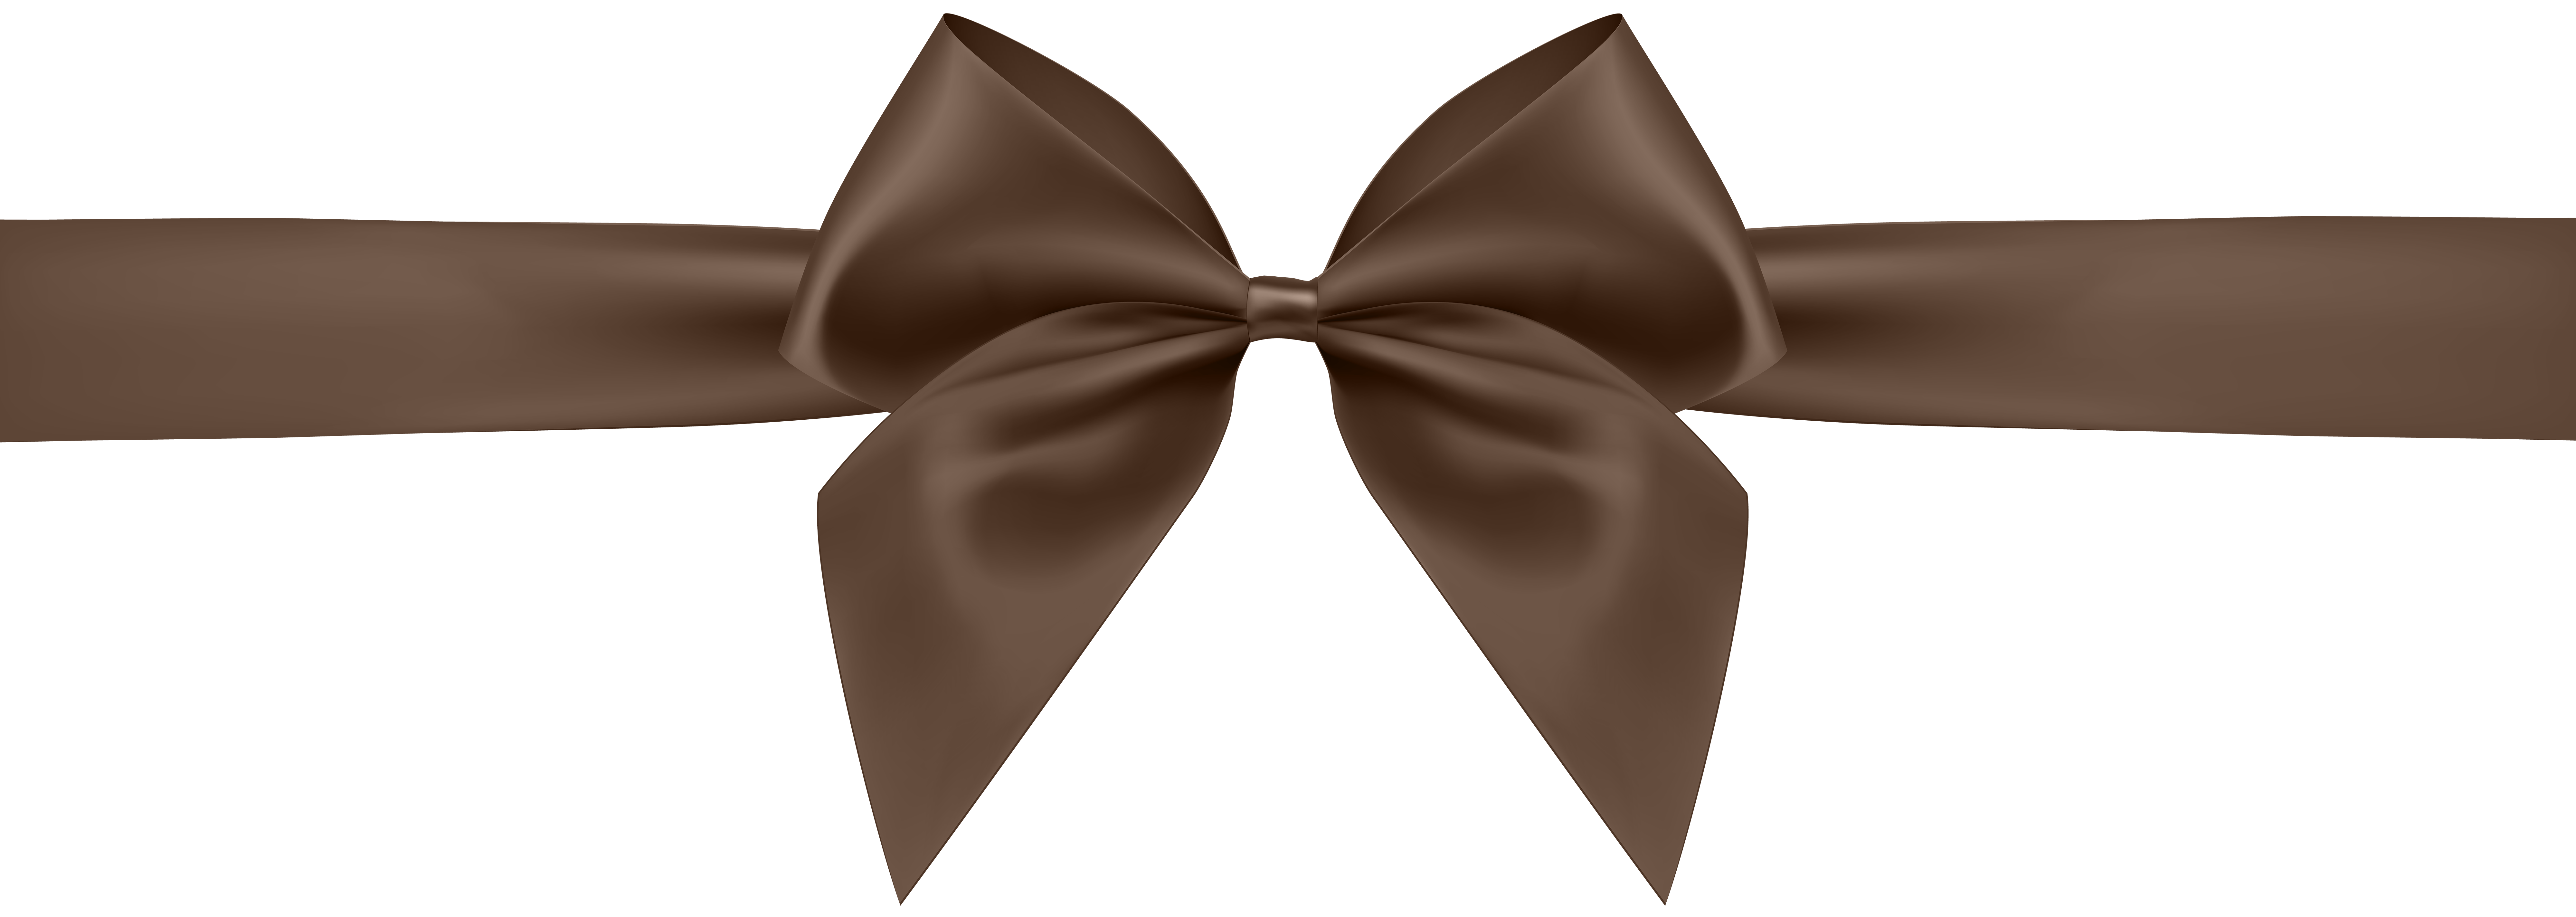 Brown Bow Transparent Clip Art Image.